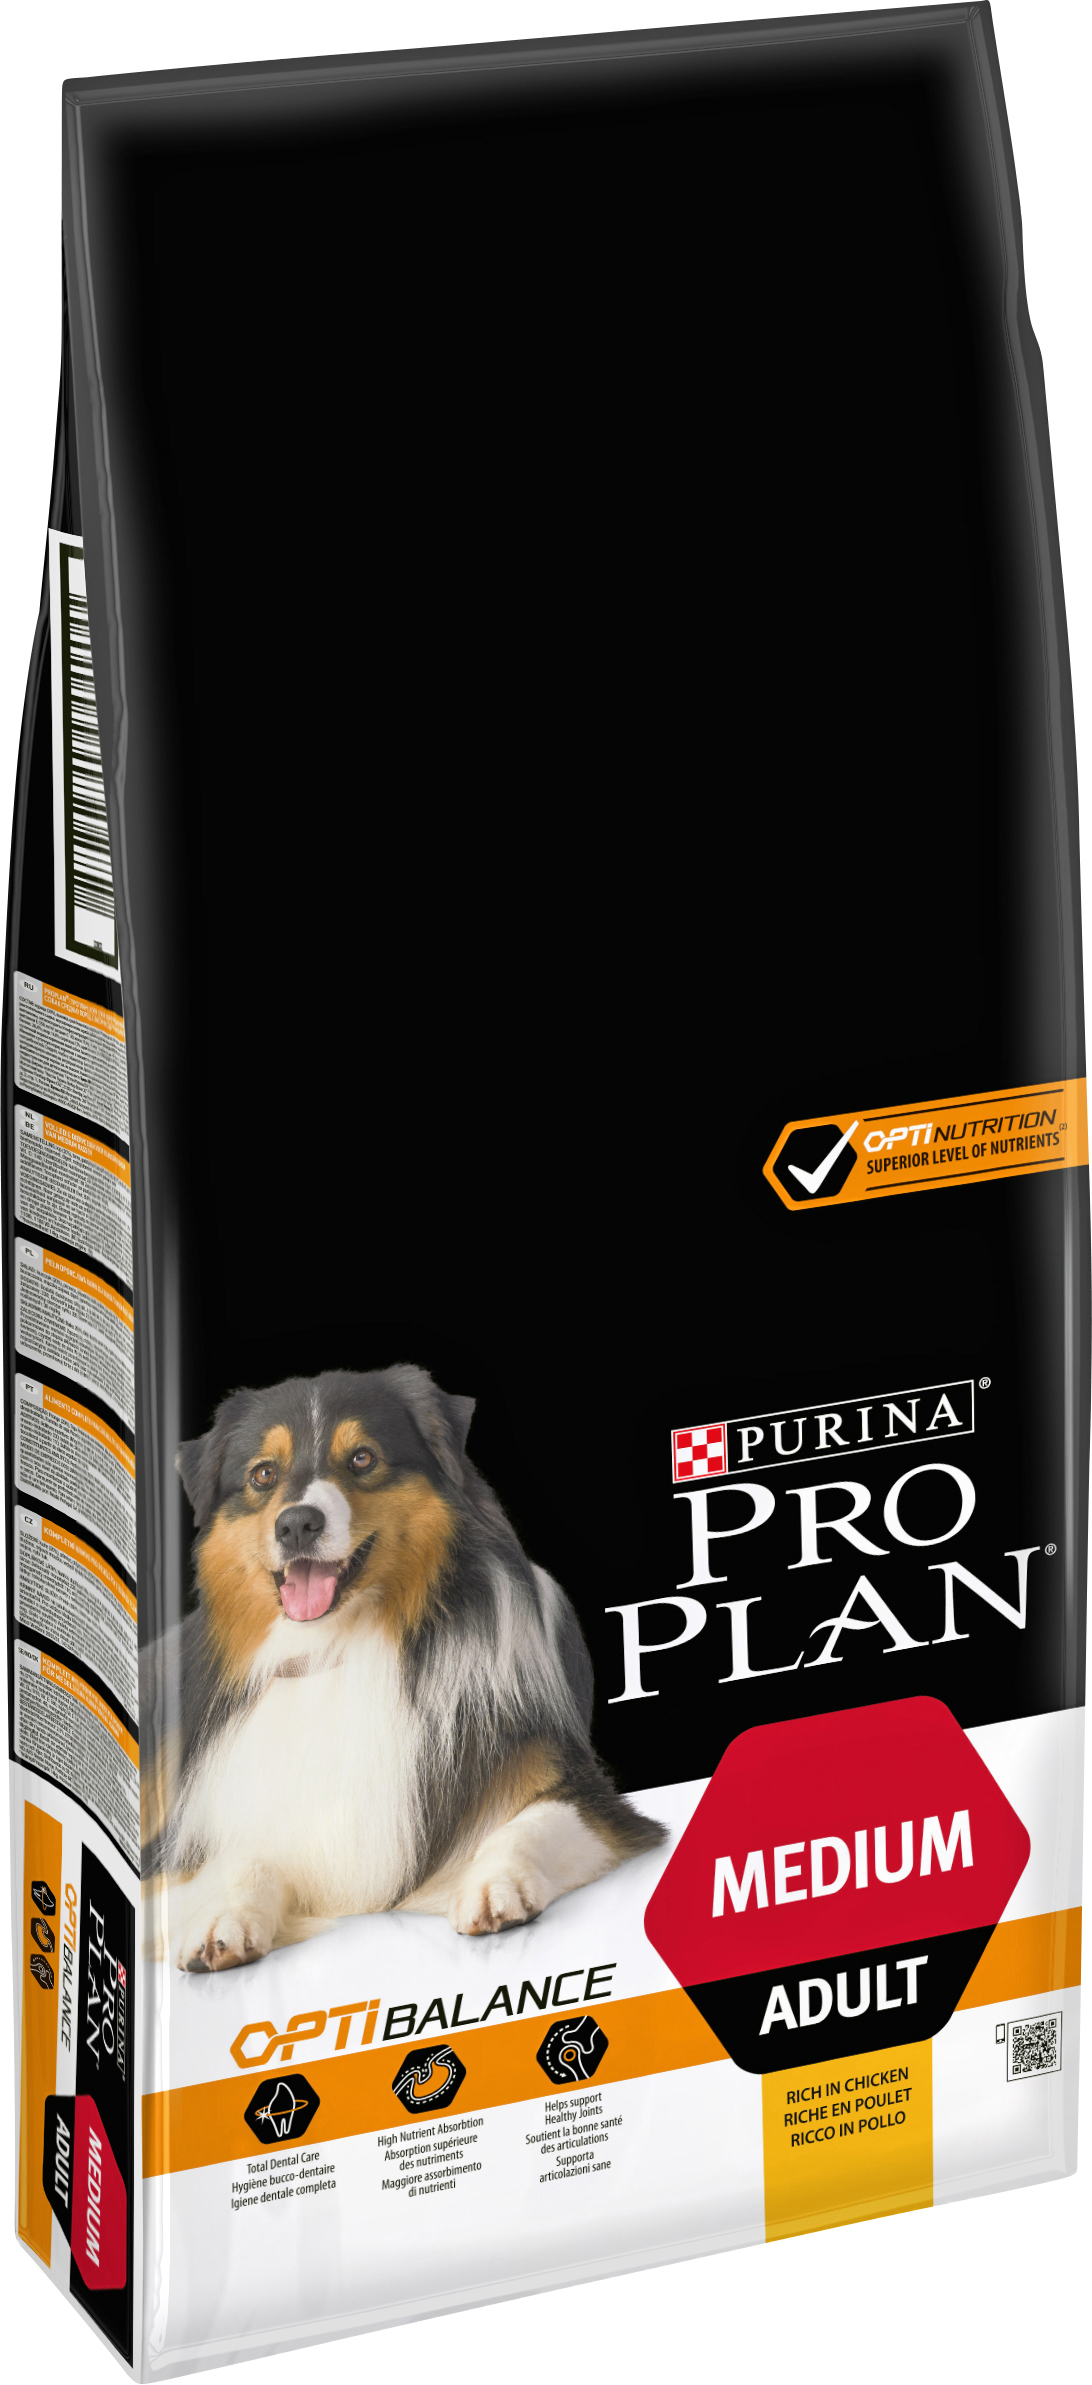 Hundfoder Pro Plan Medium Adult, 14 kg